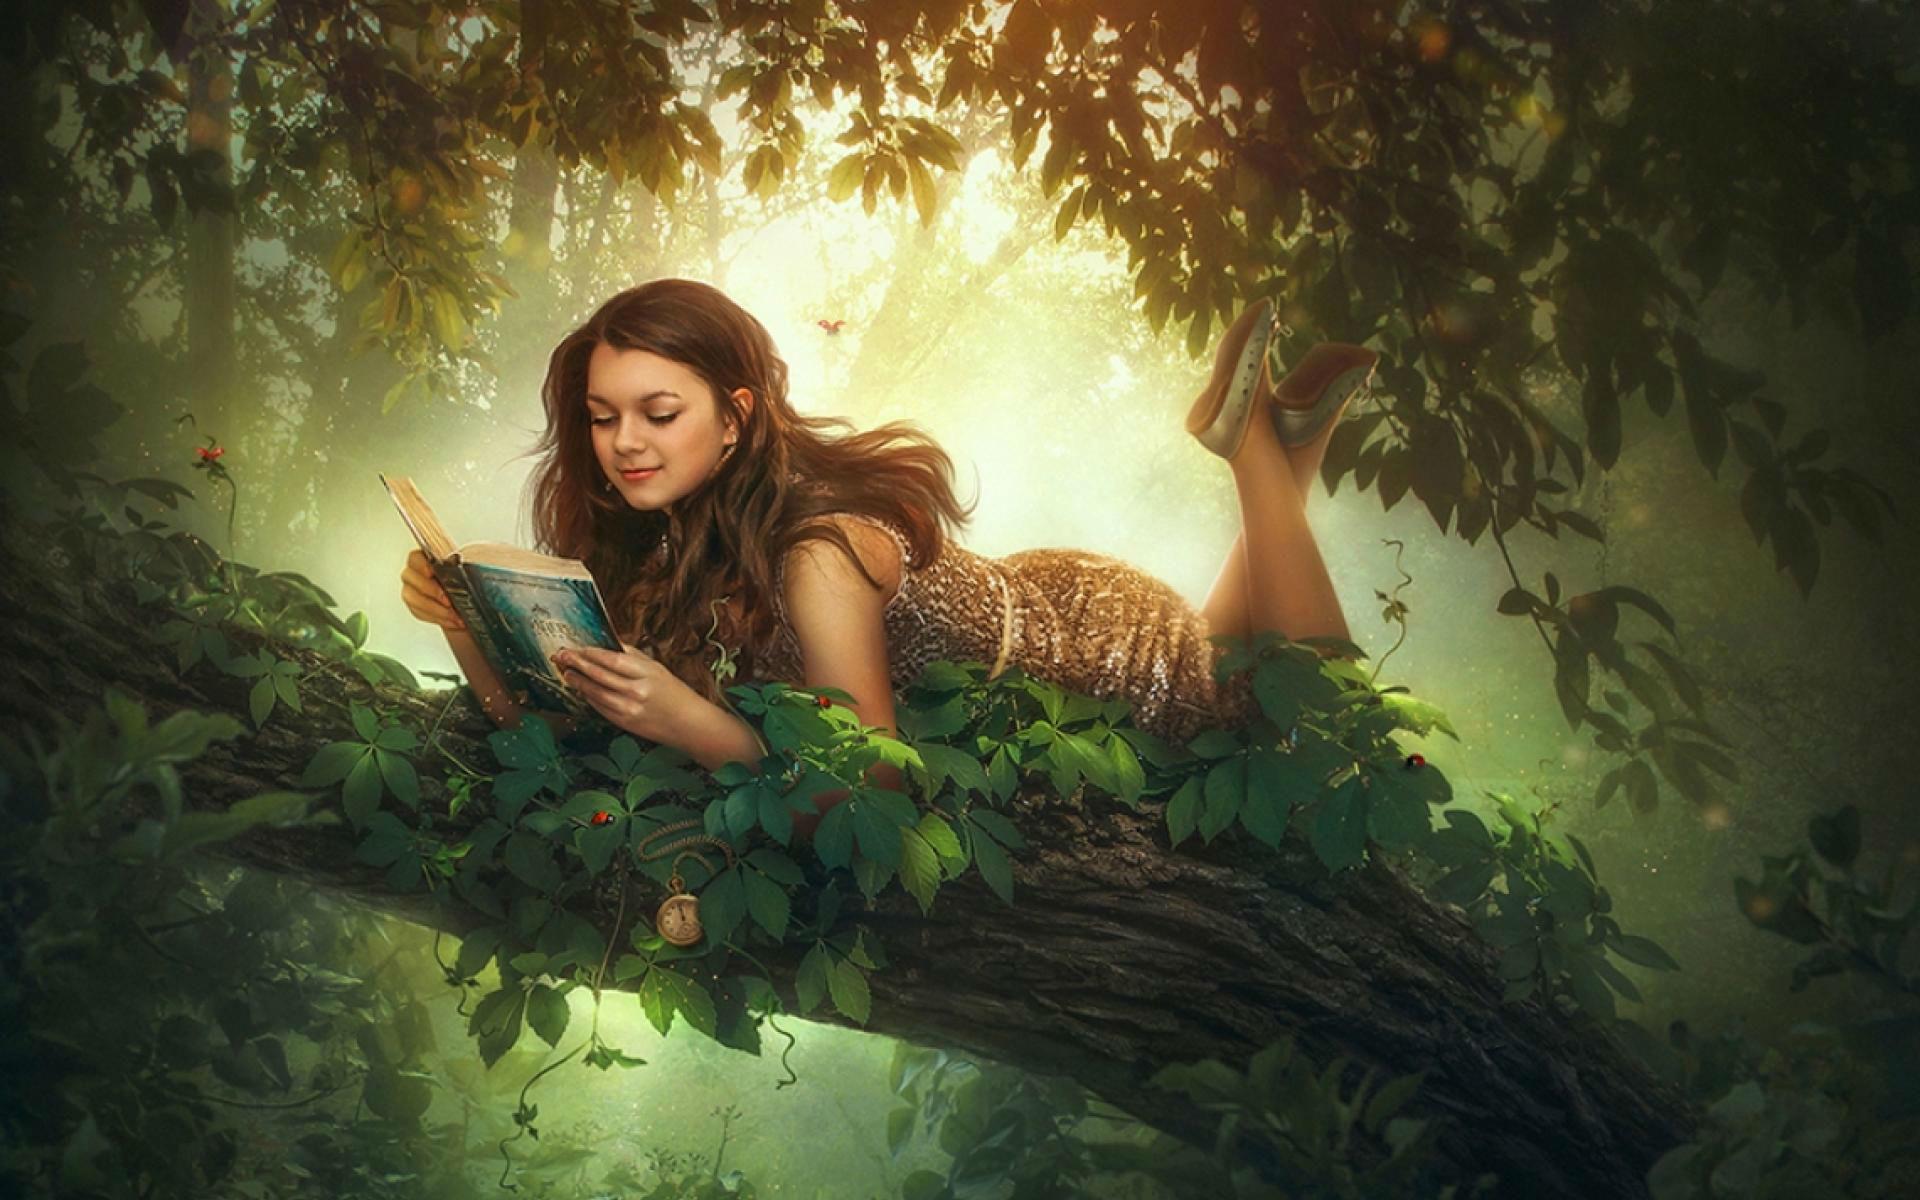 Fantasy Girl Backgrounds